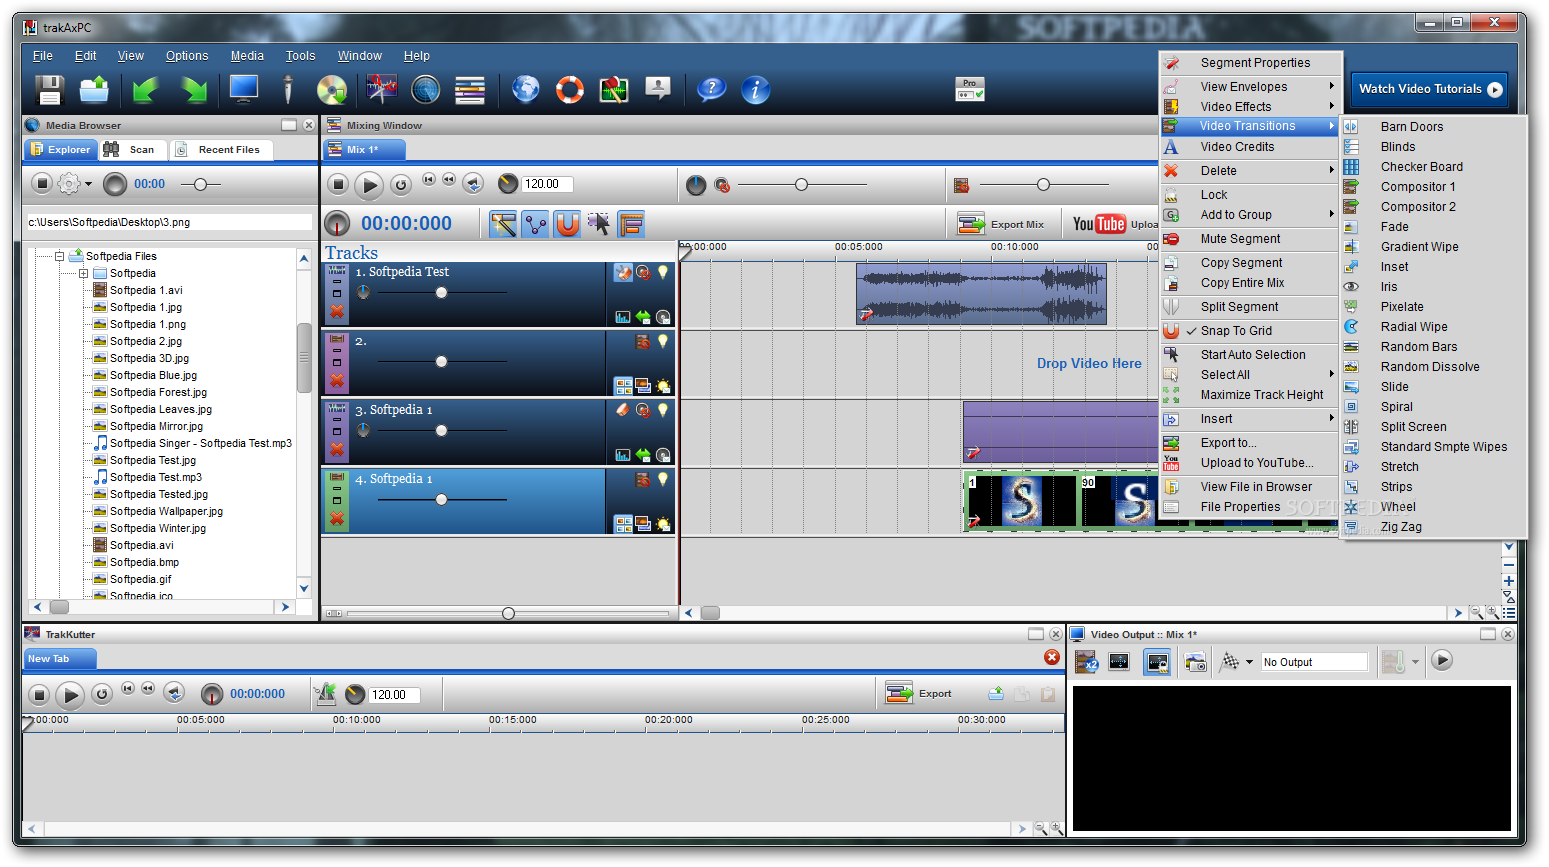 Trakax software